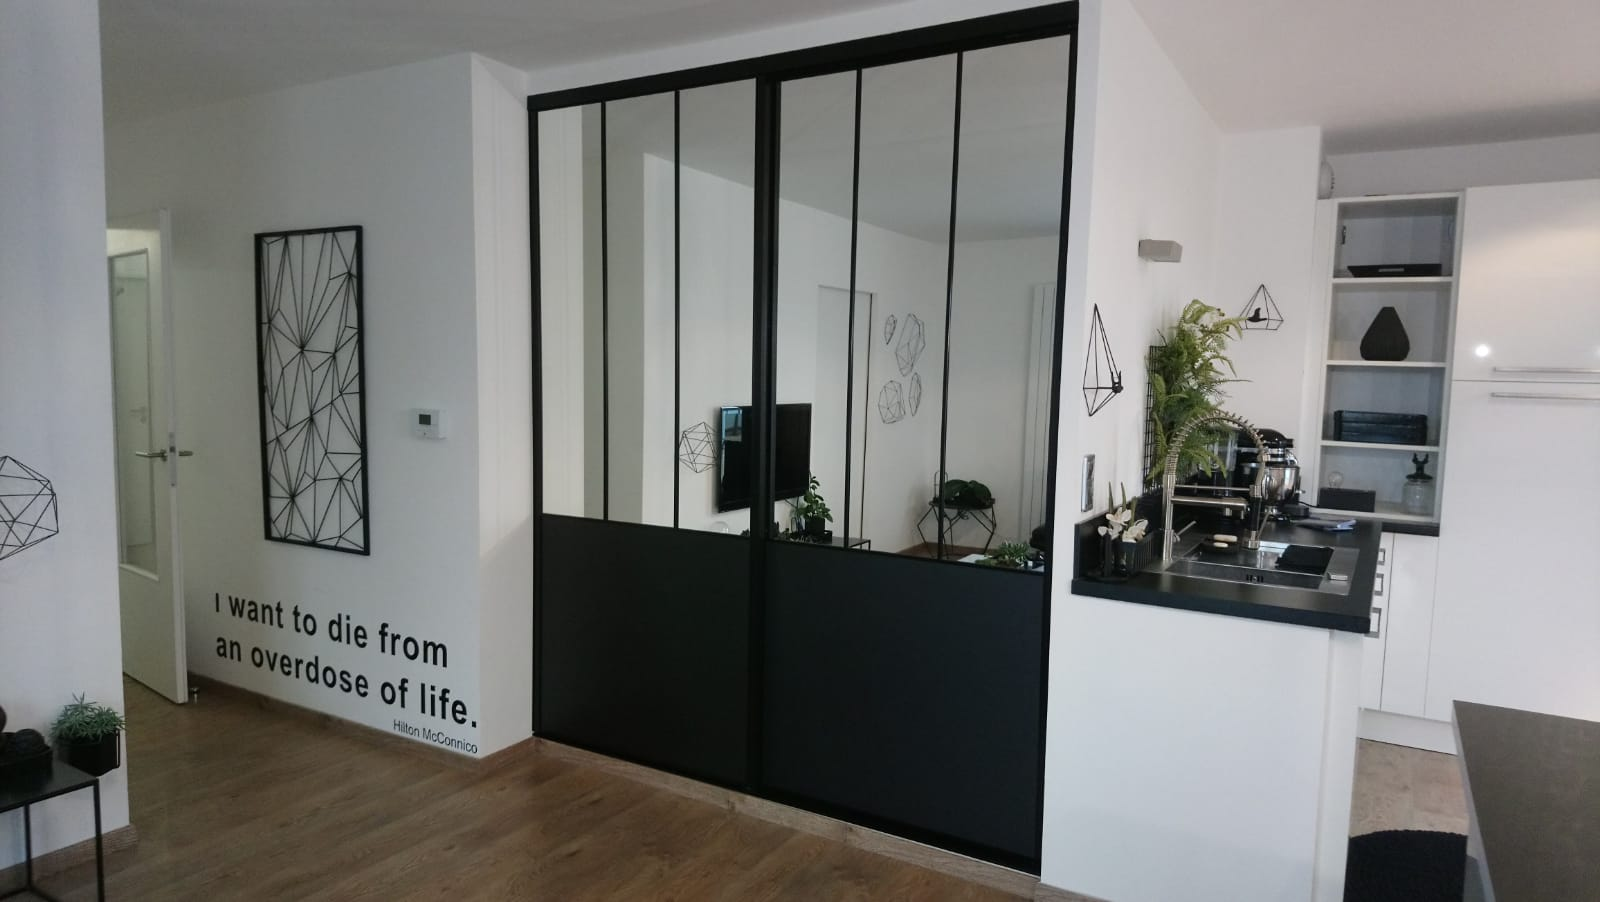 Porte de placard style atelier nze02 napanonprofits - Porte de placard style atelier ...